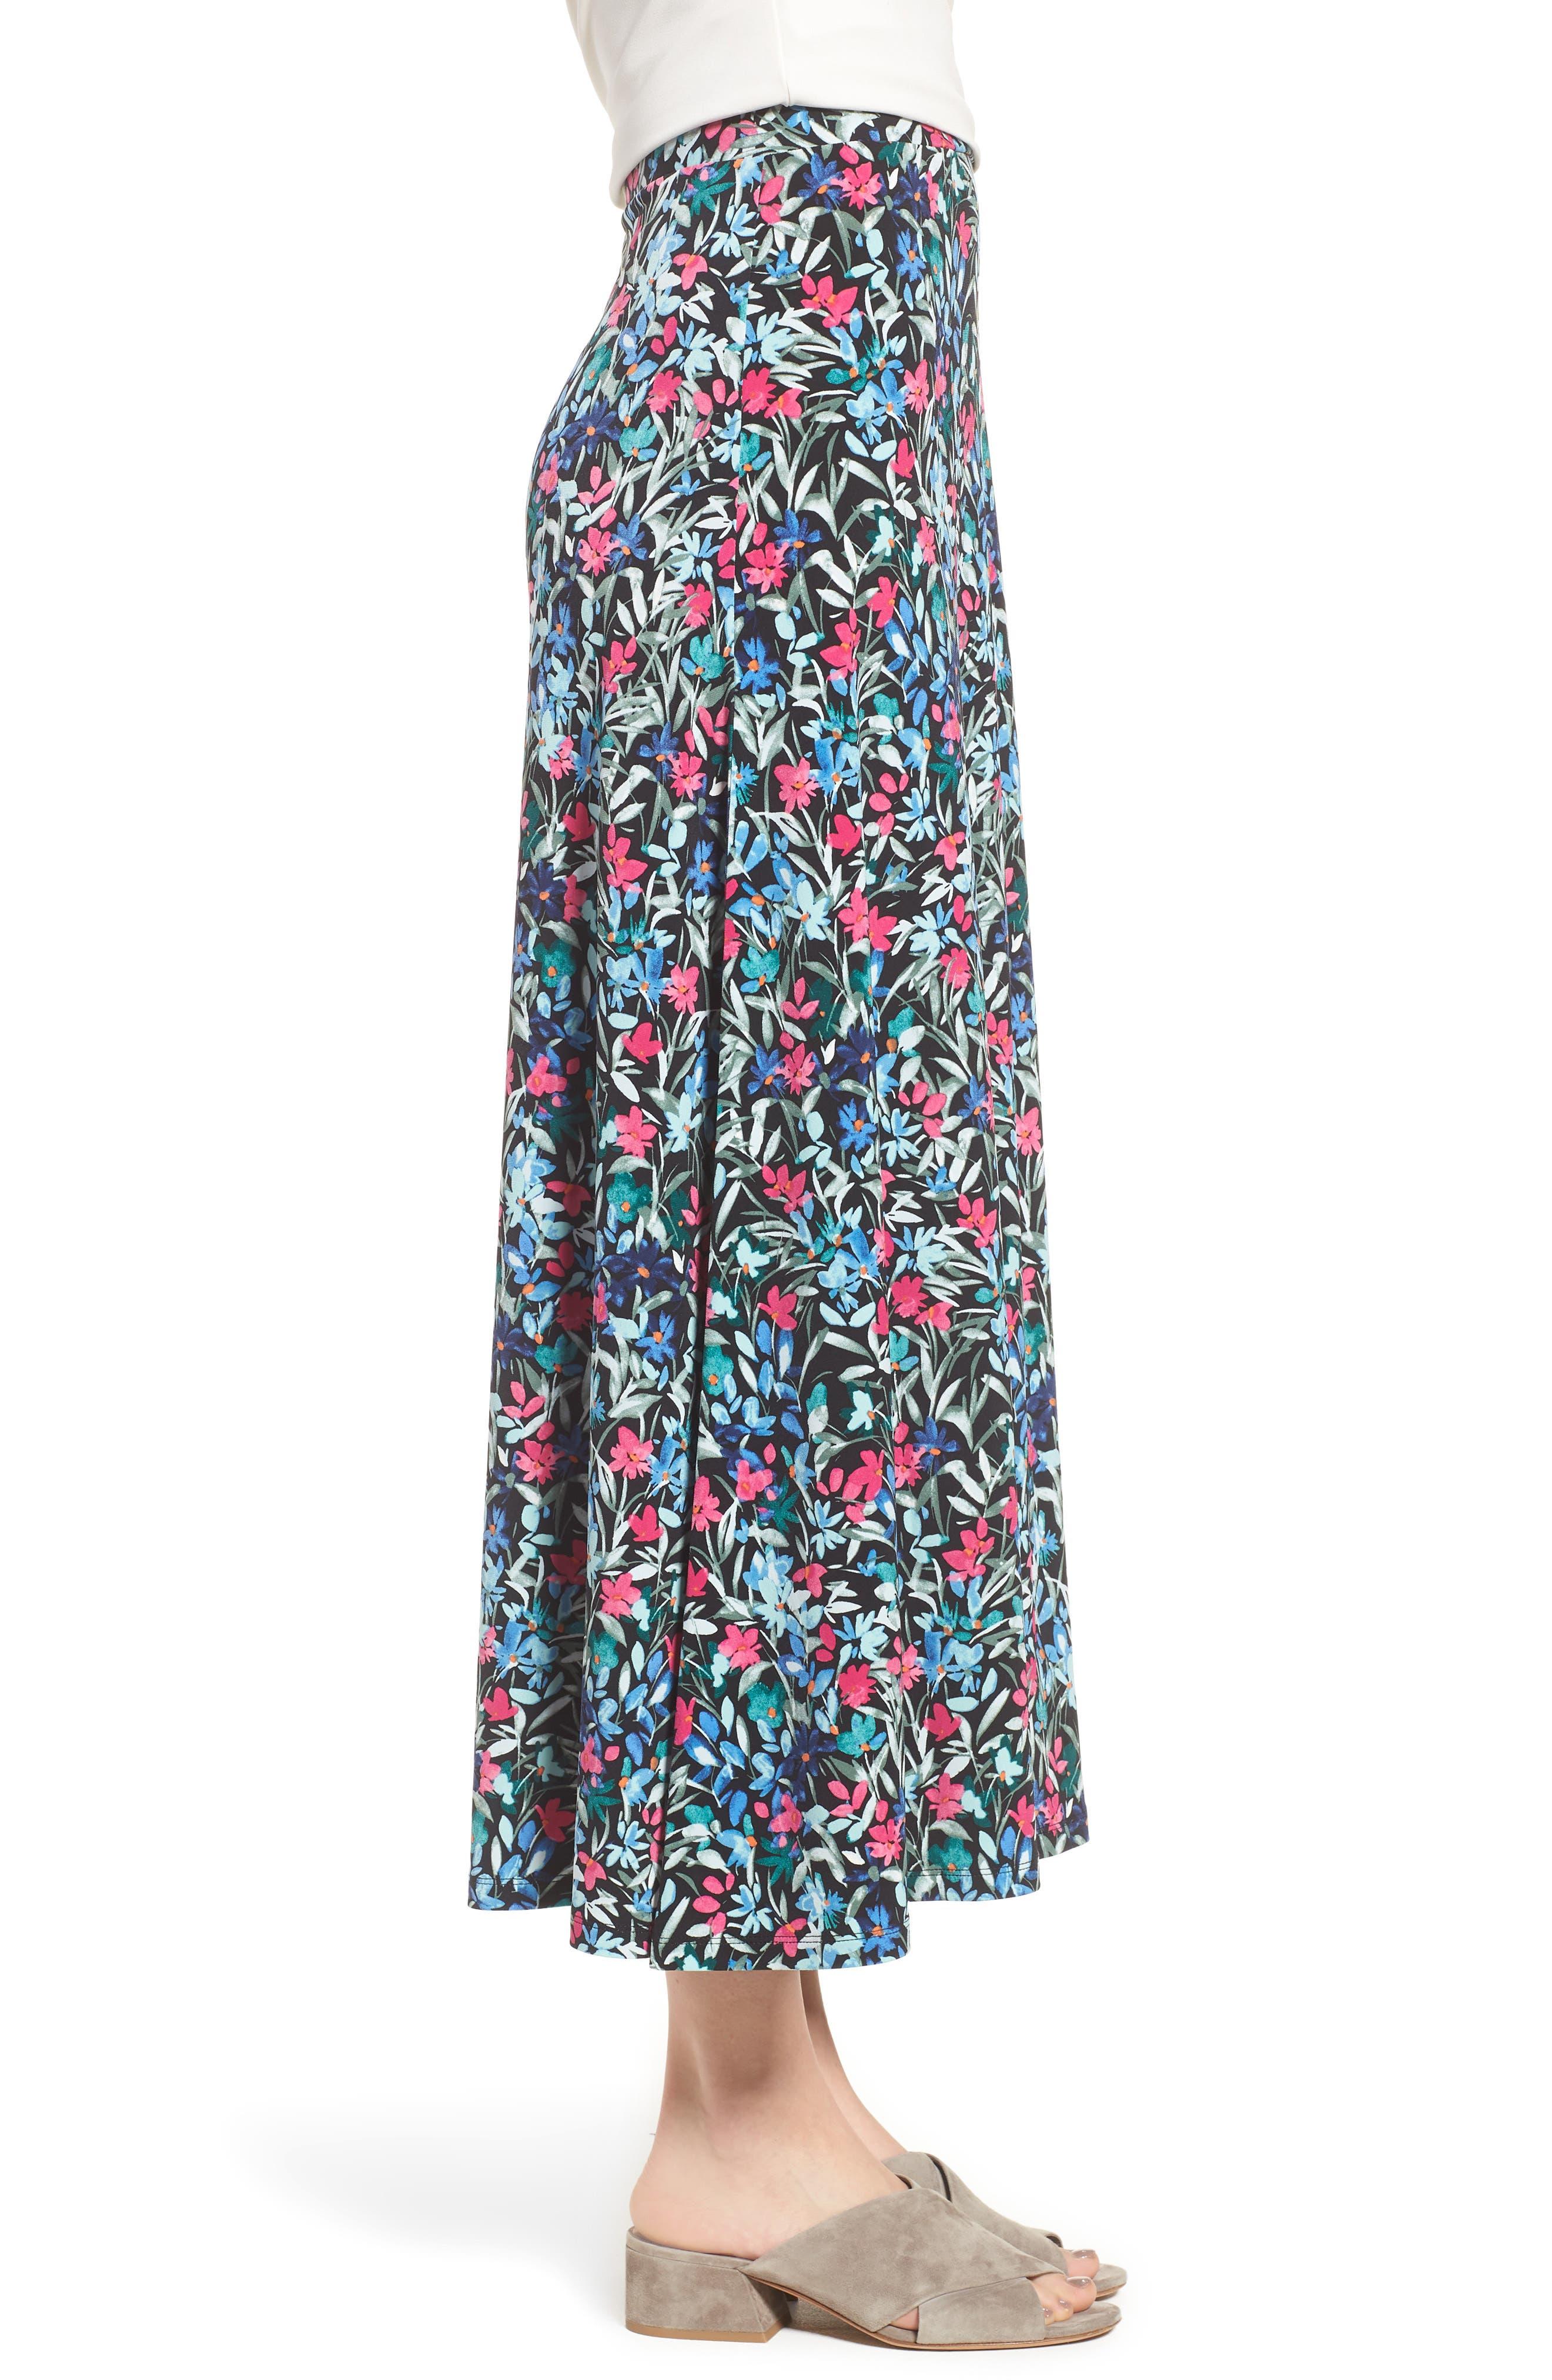 Radiant Flowers Maxi Skirt,                             Alternate thumbnail 3, color,                             060-Rich Black